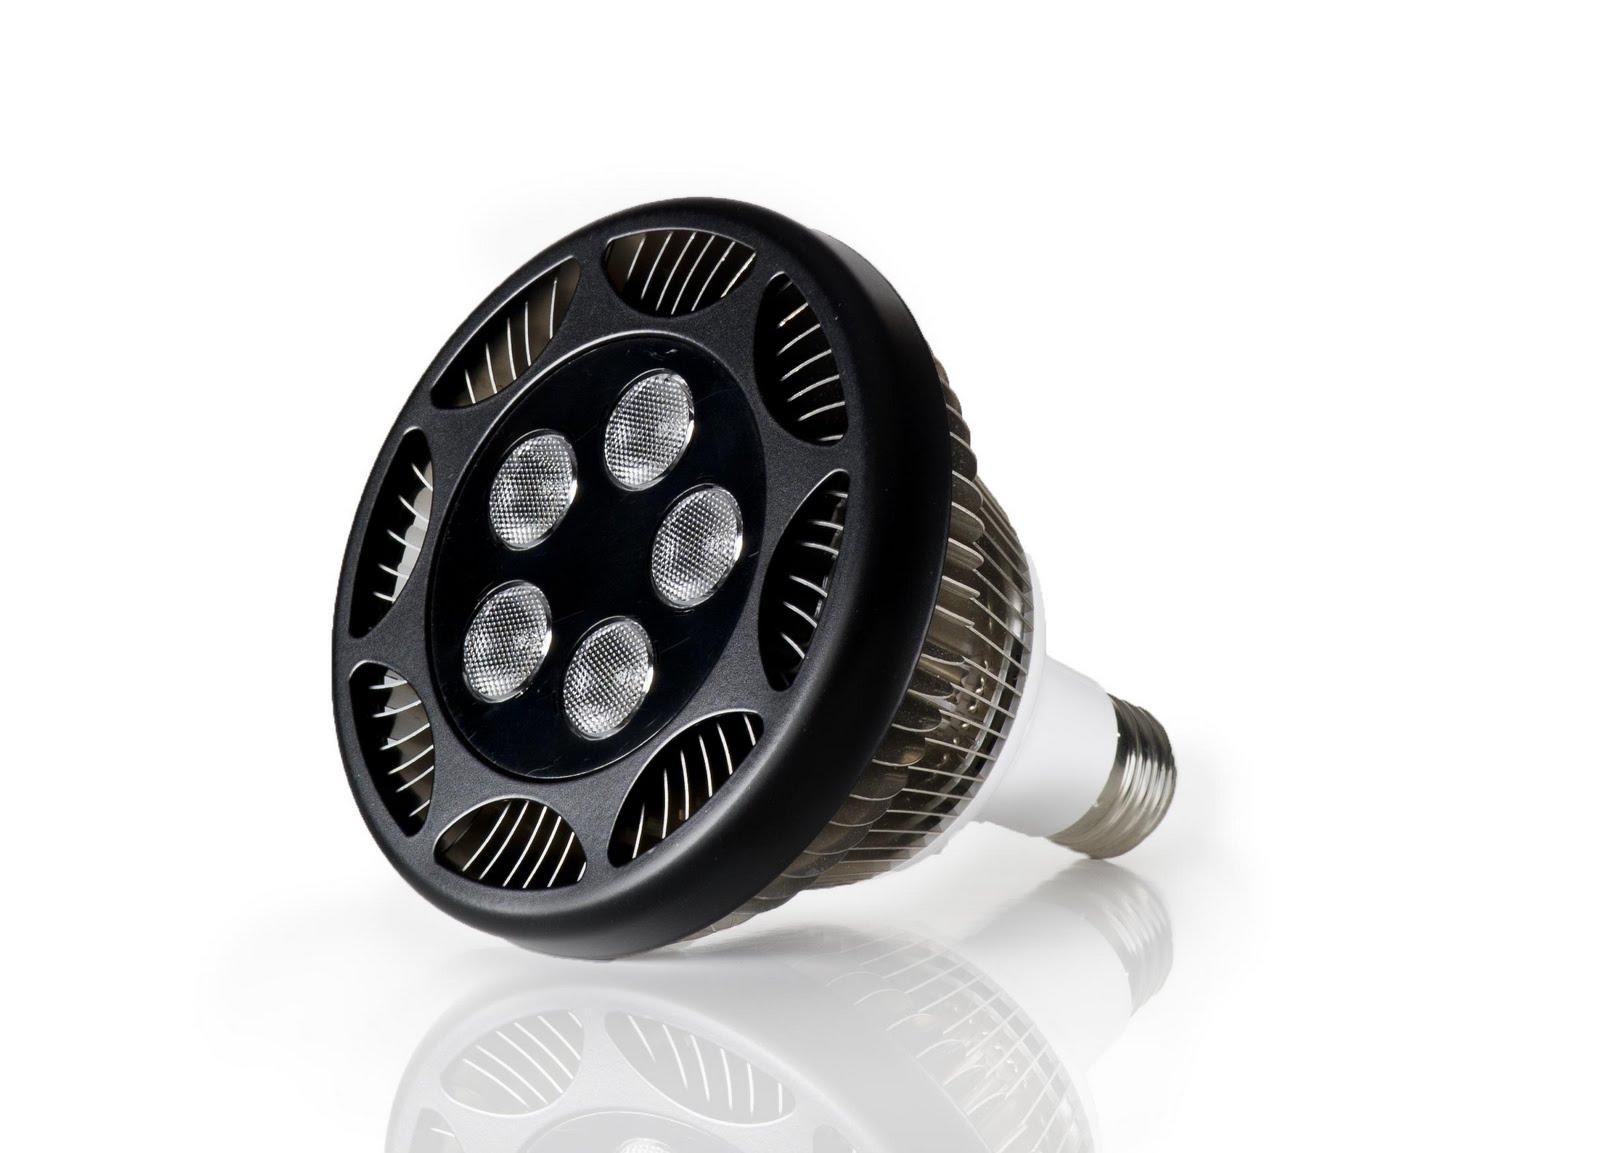 led lamps photo - 5